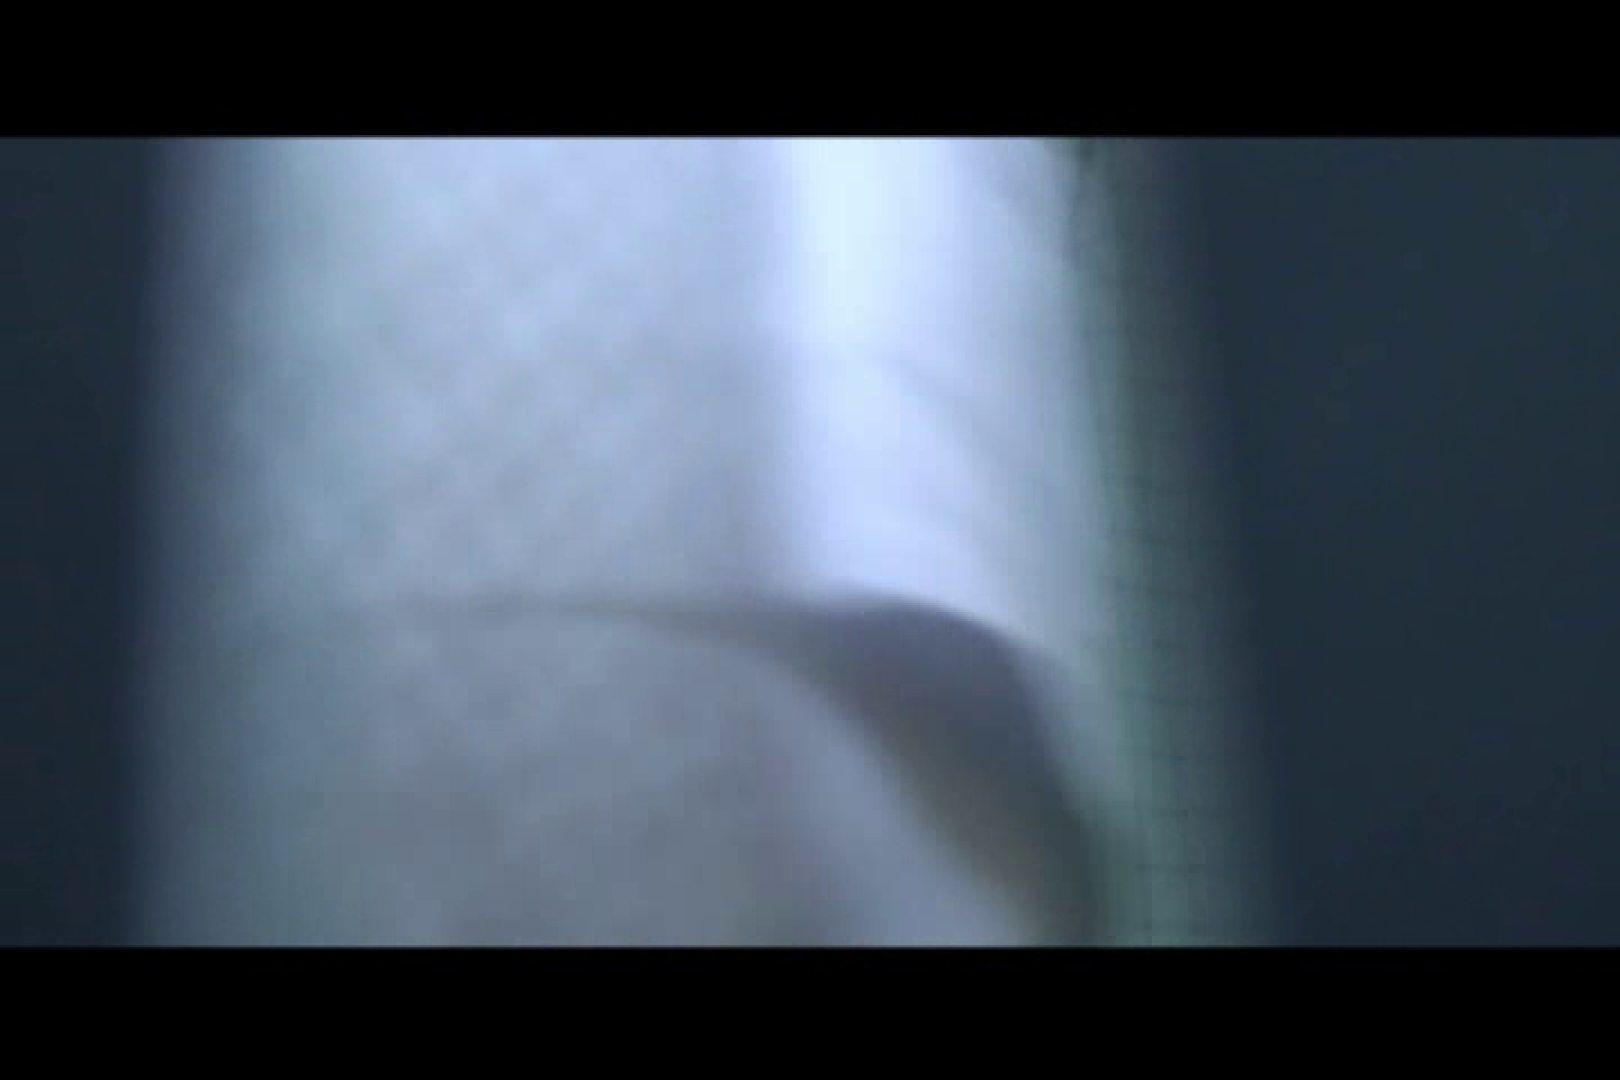 独占配信!無修正! 看護女子寮 vol.09 エロいナース 盗撮動画紹介 103枚